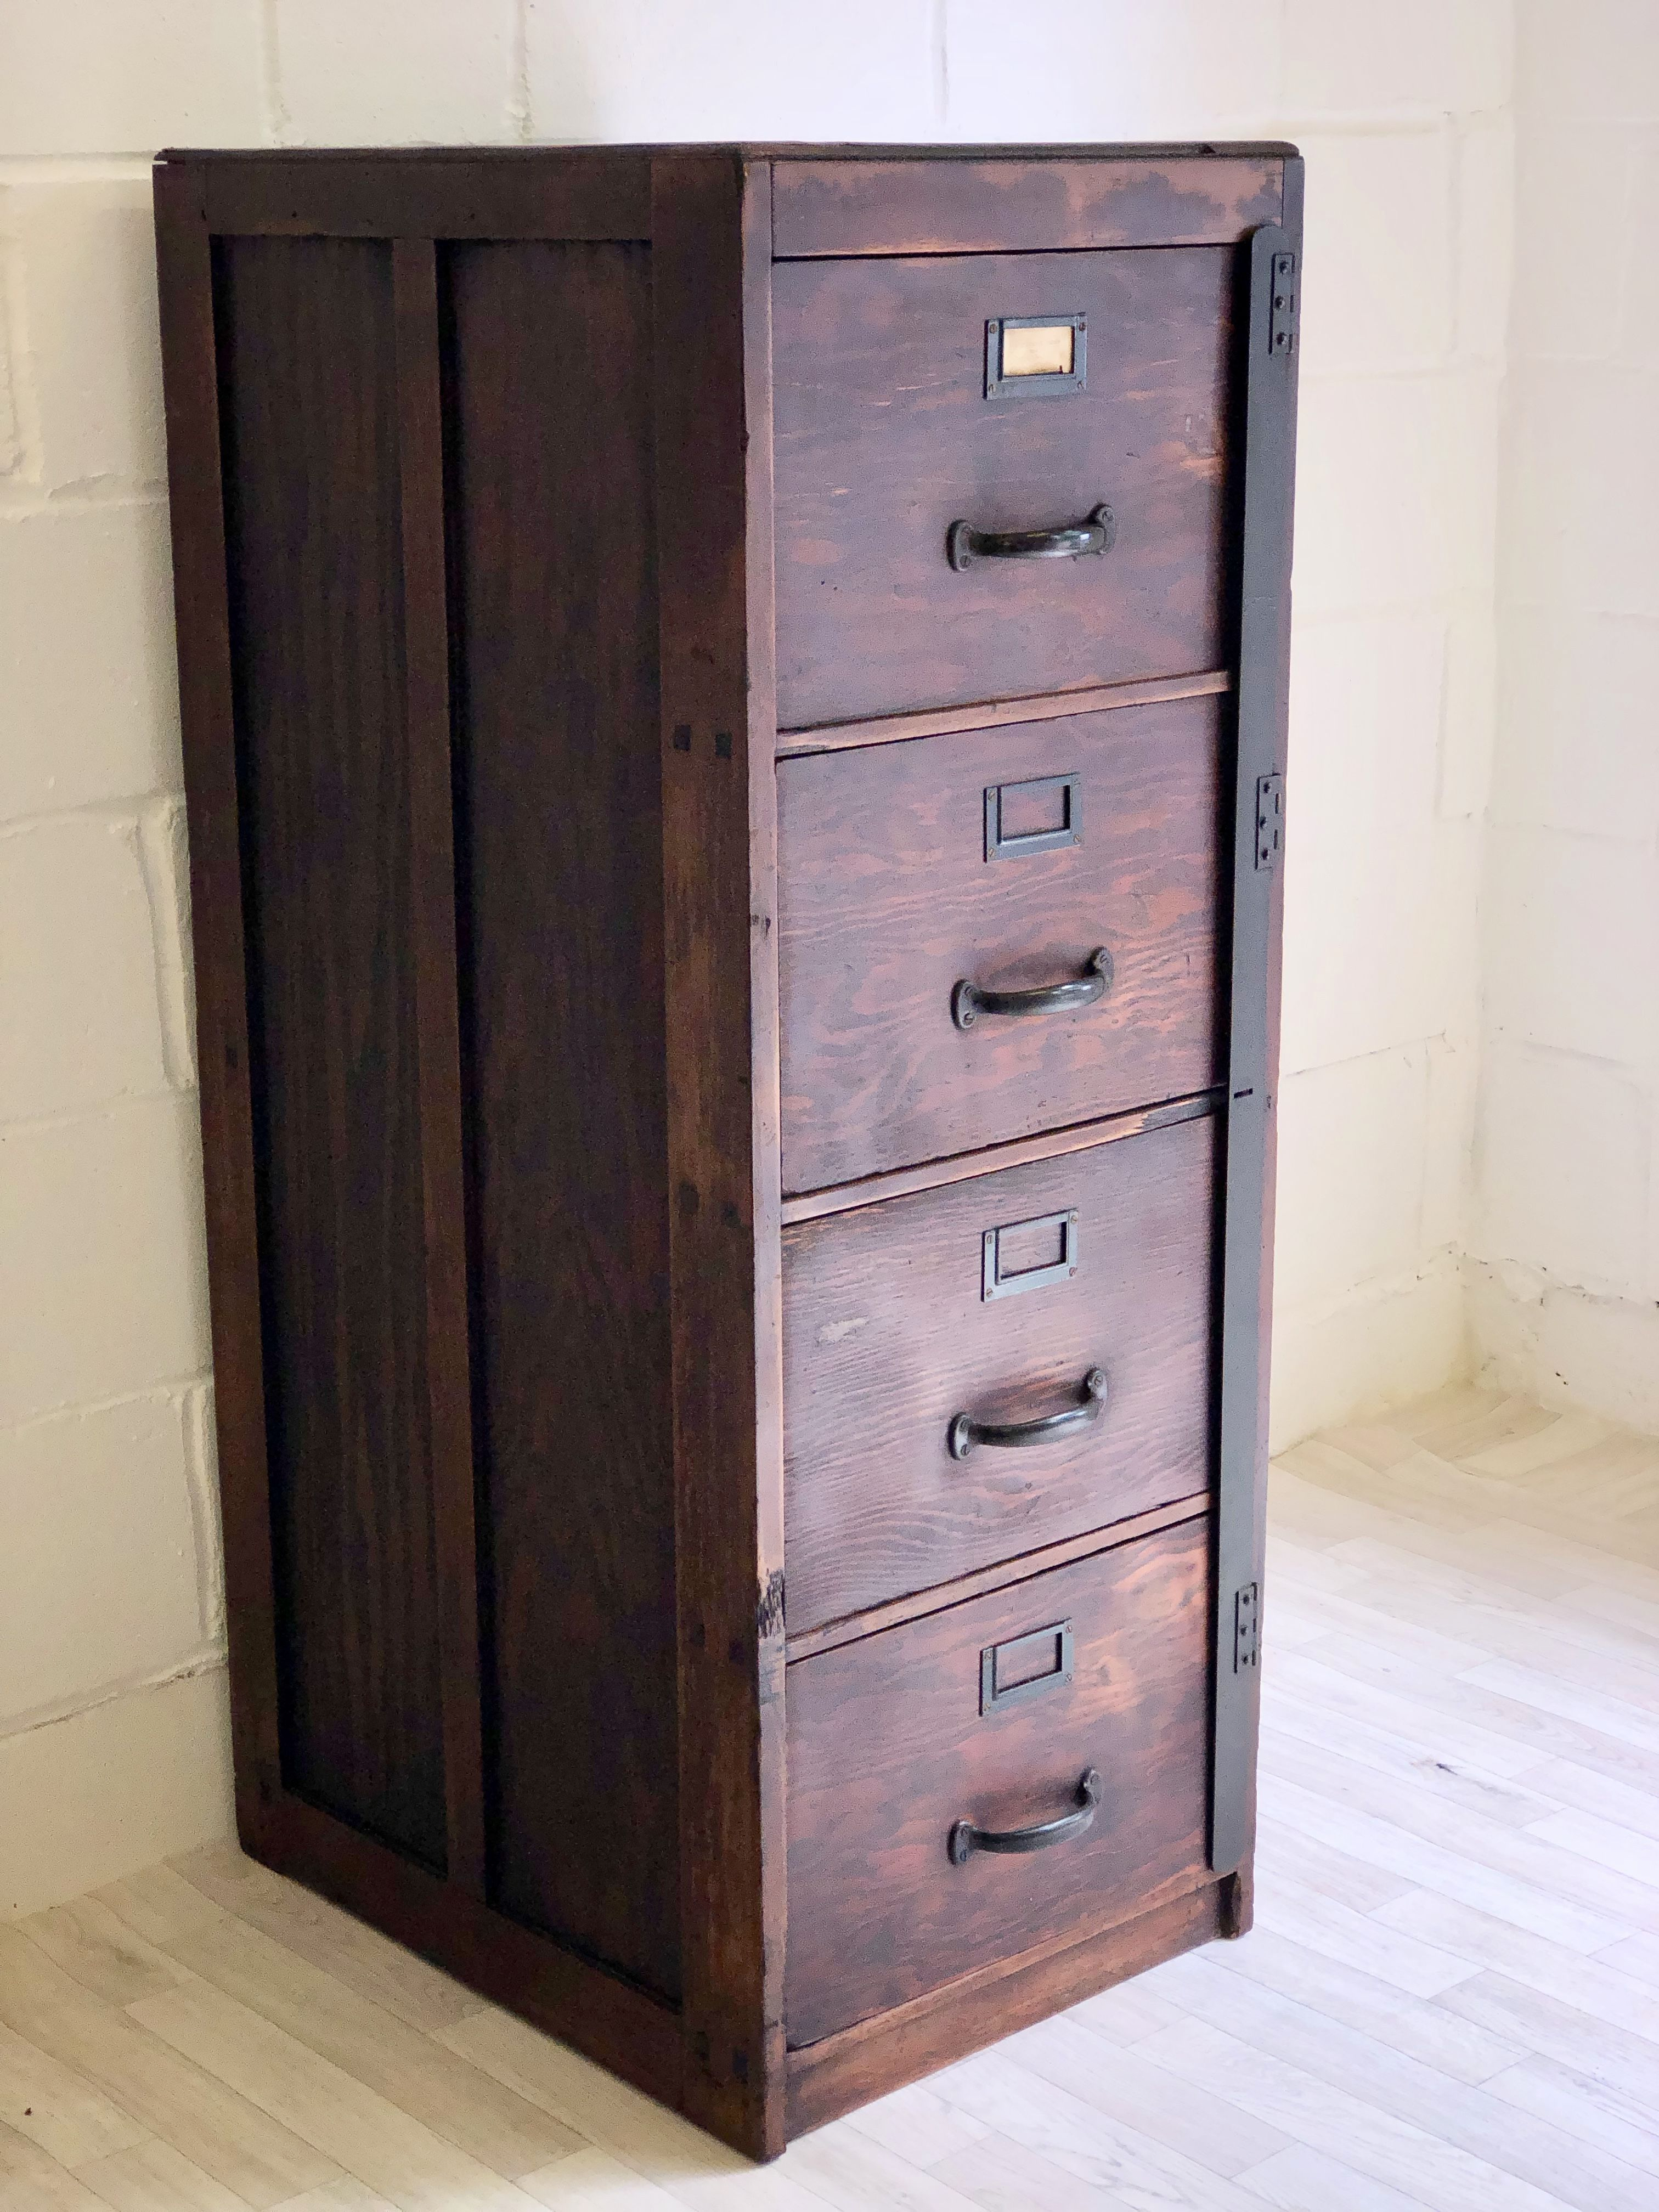 1940s Vintage Filing Cabinet 4 Drawers With Metal Locking Bar In